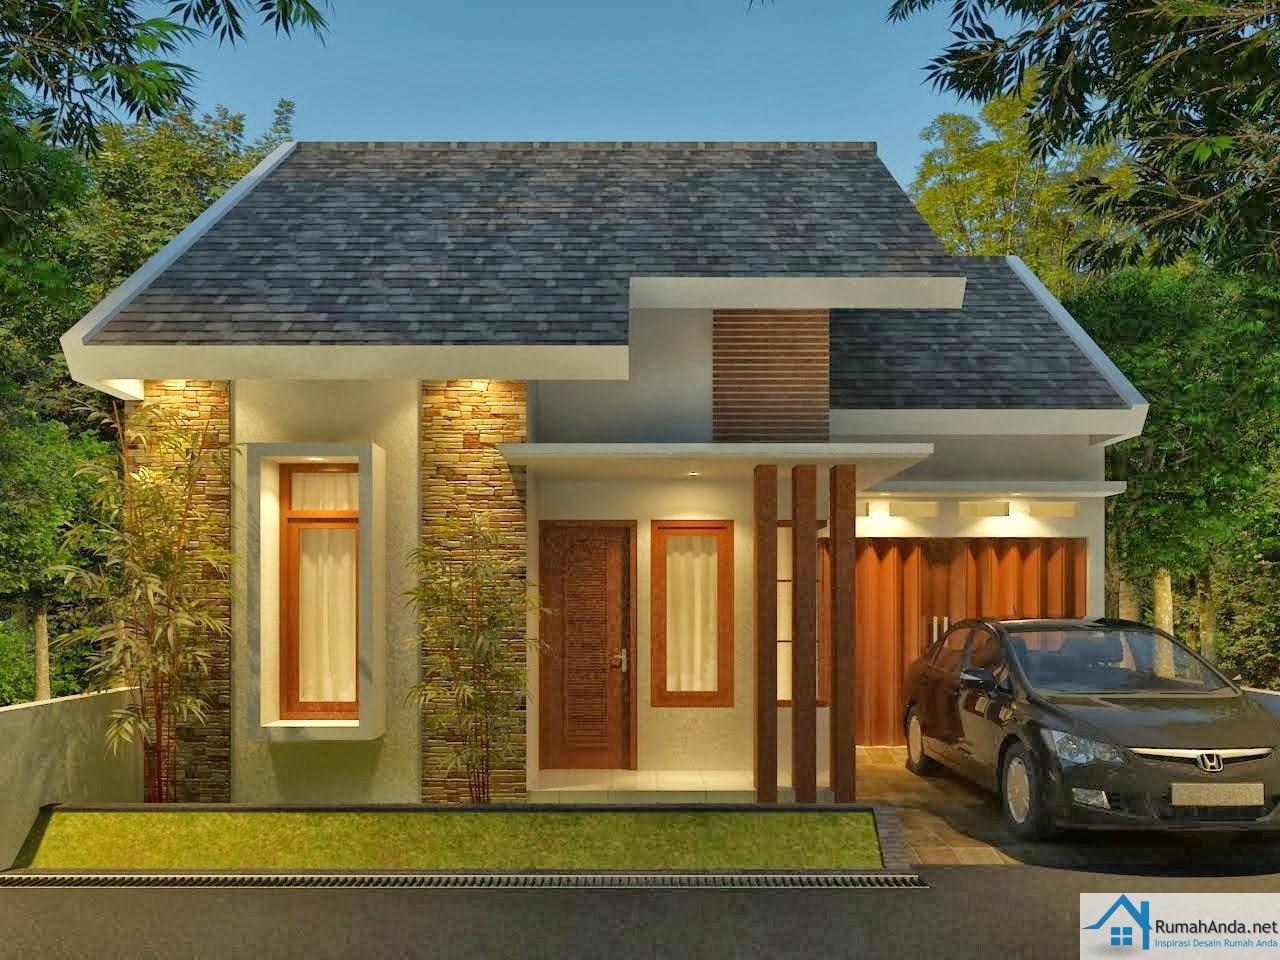 Desain Rumah Minimalis 1 Lantai Keren